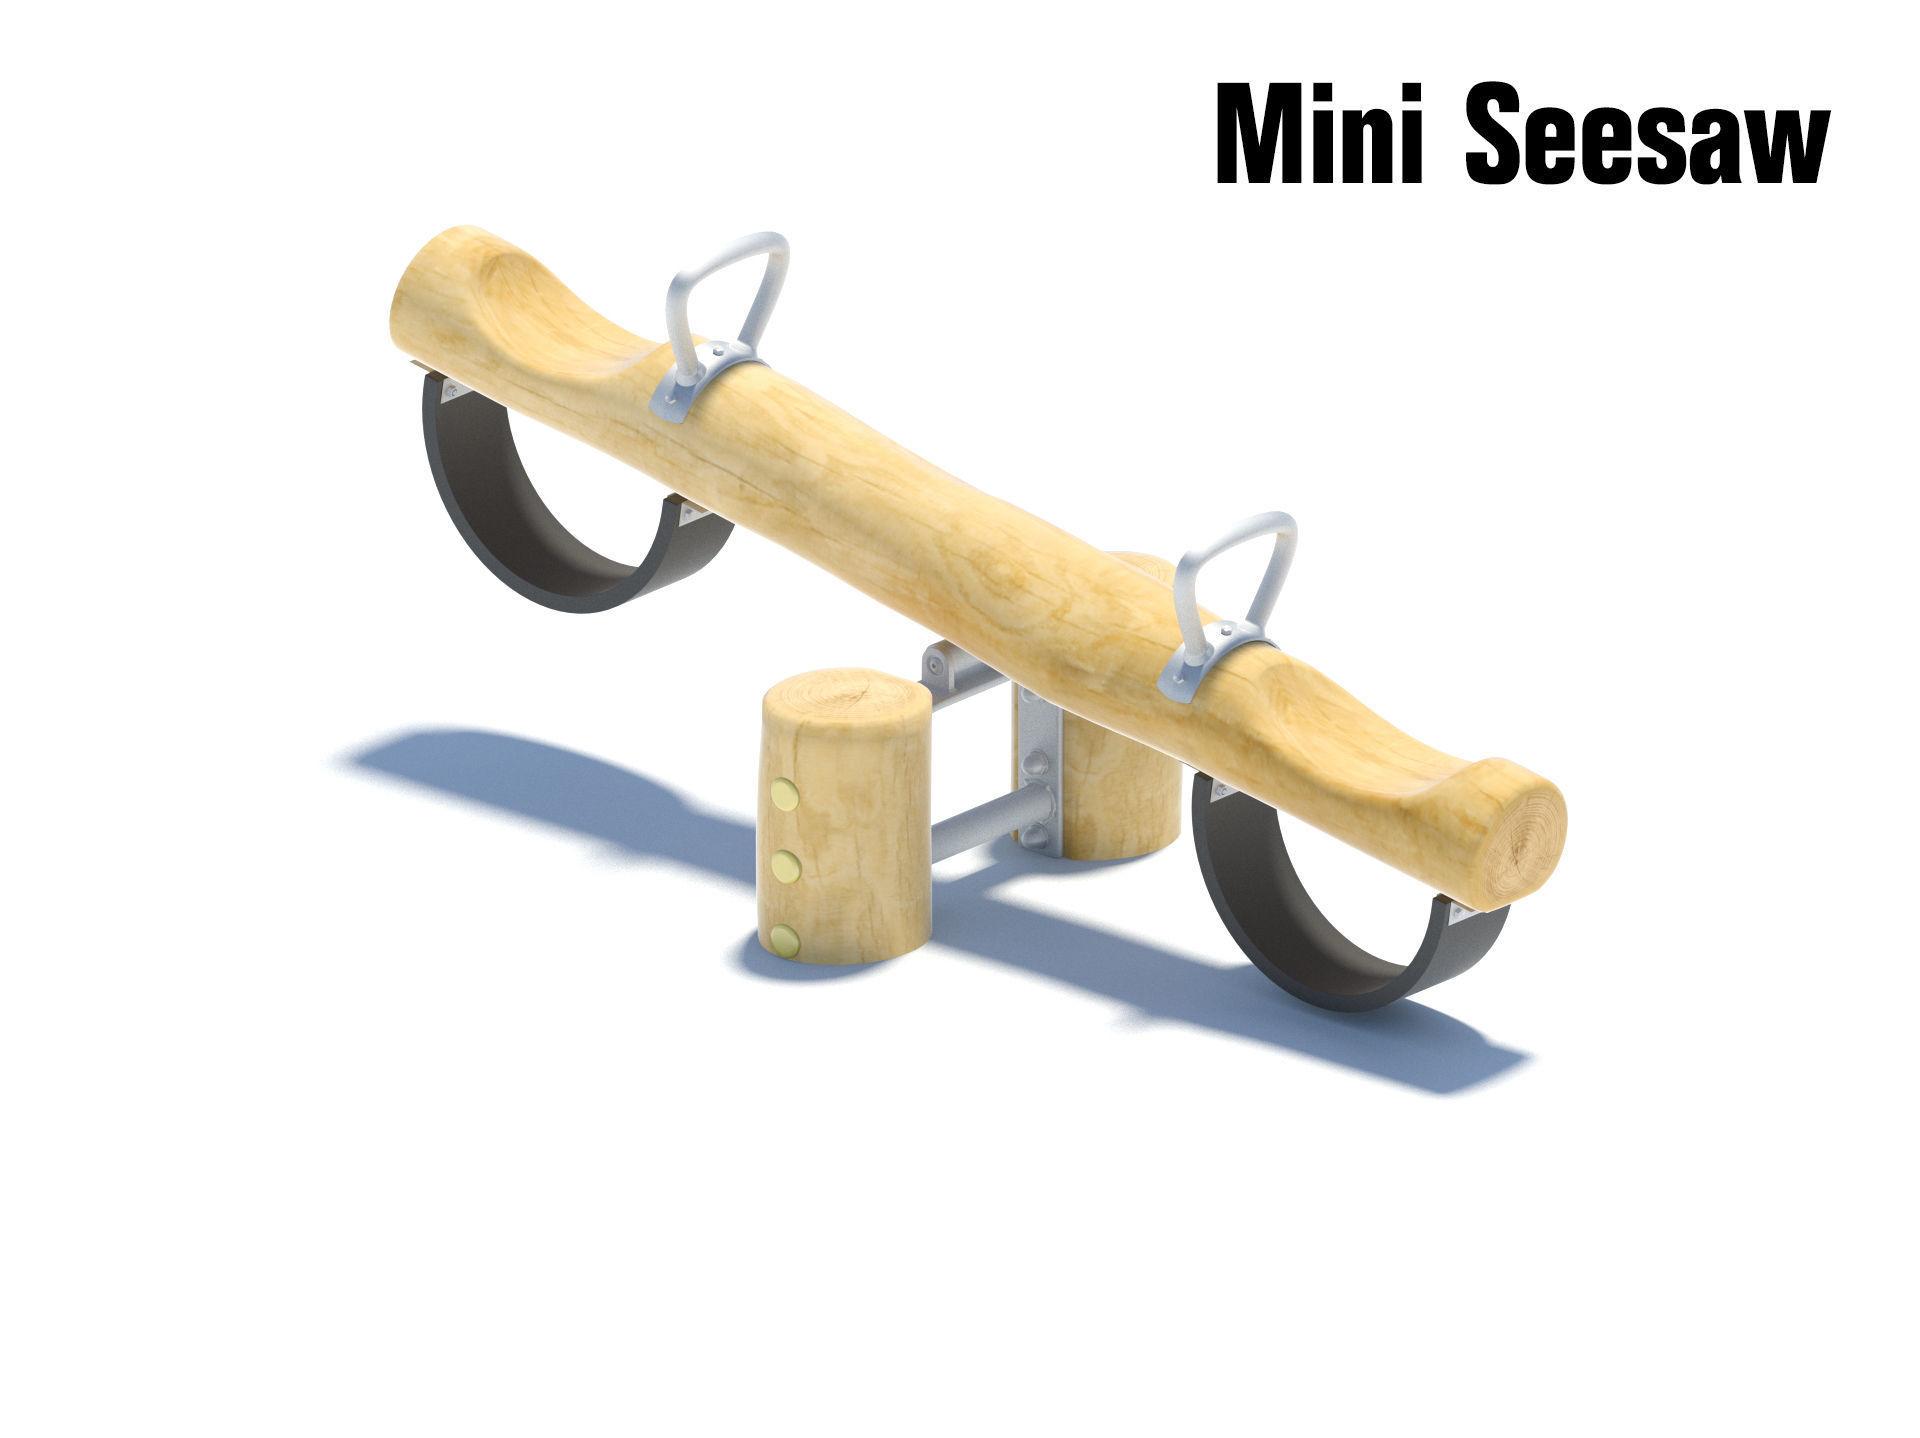 Wooden mini seesaw for small children